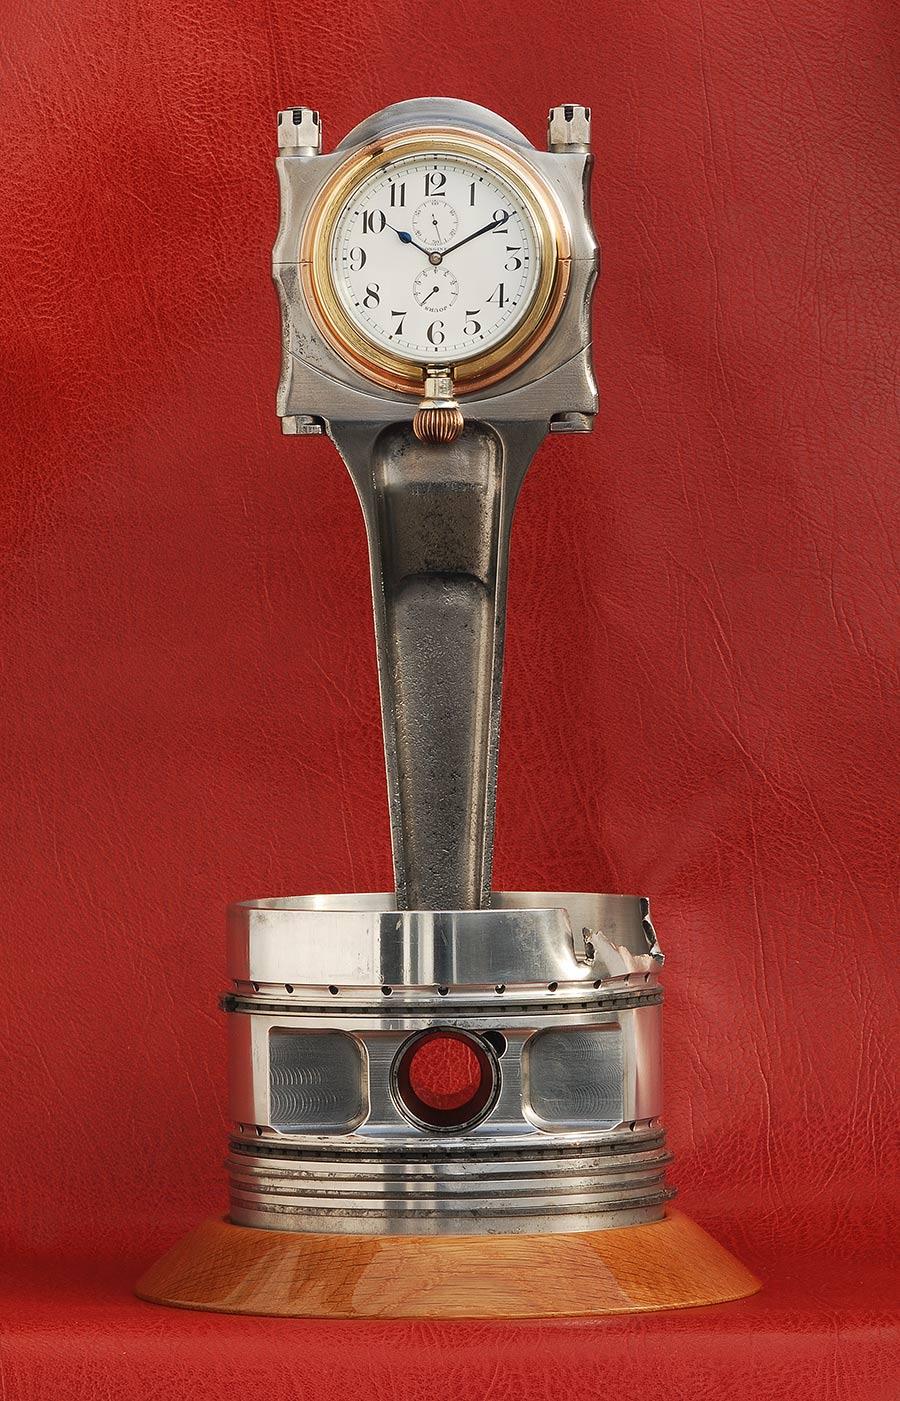 Spitfire X4276 Merlin Piston Clock